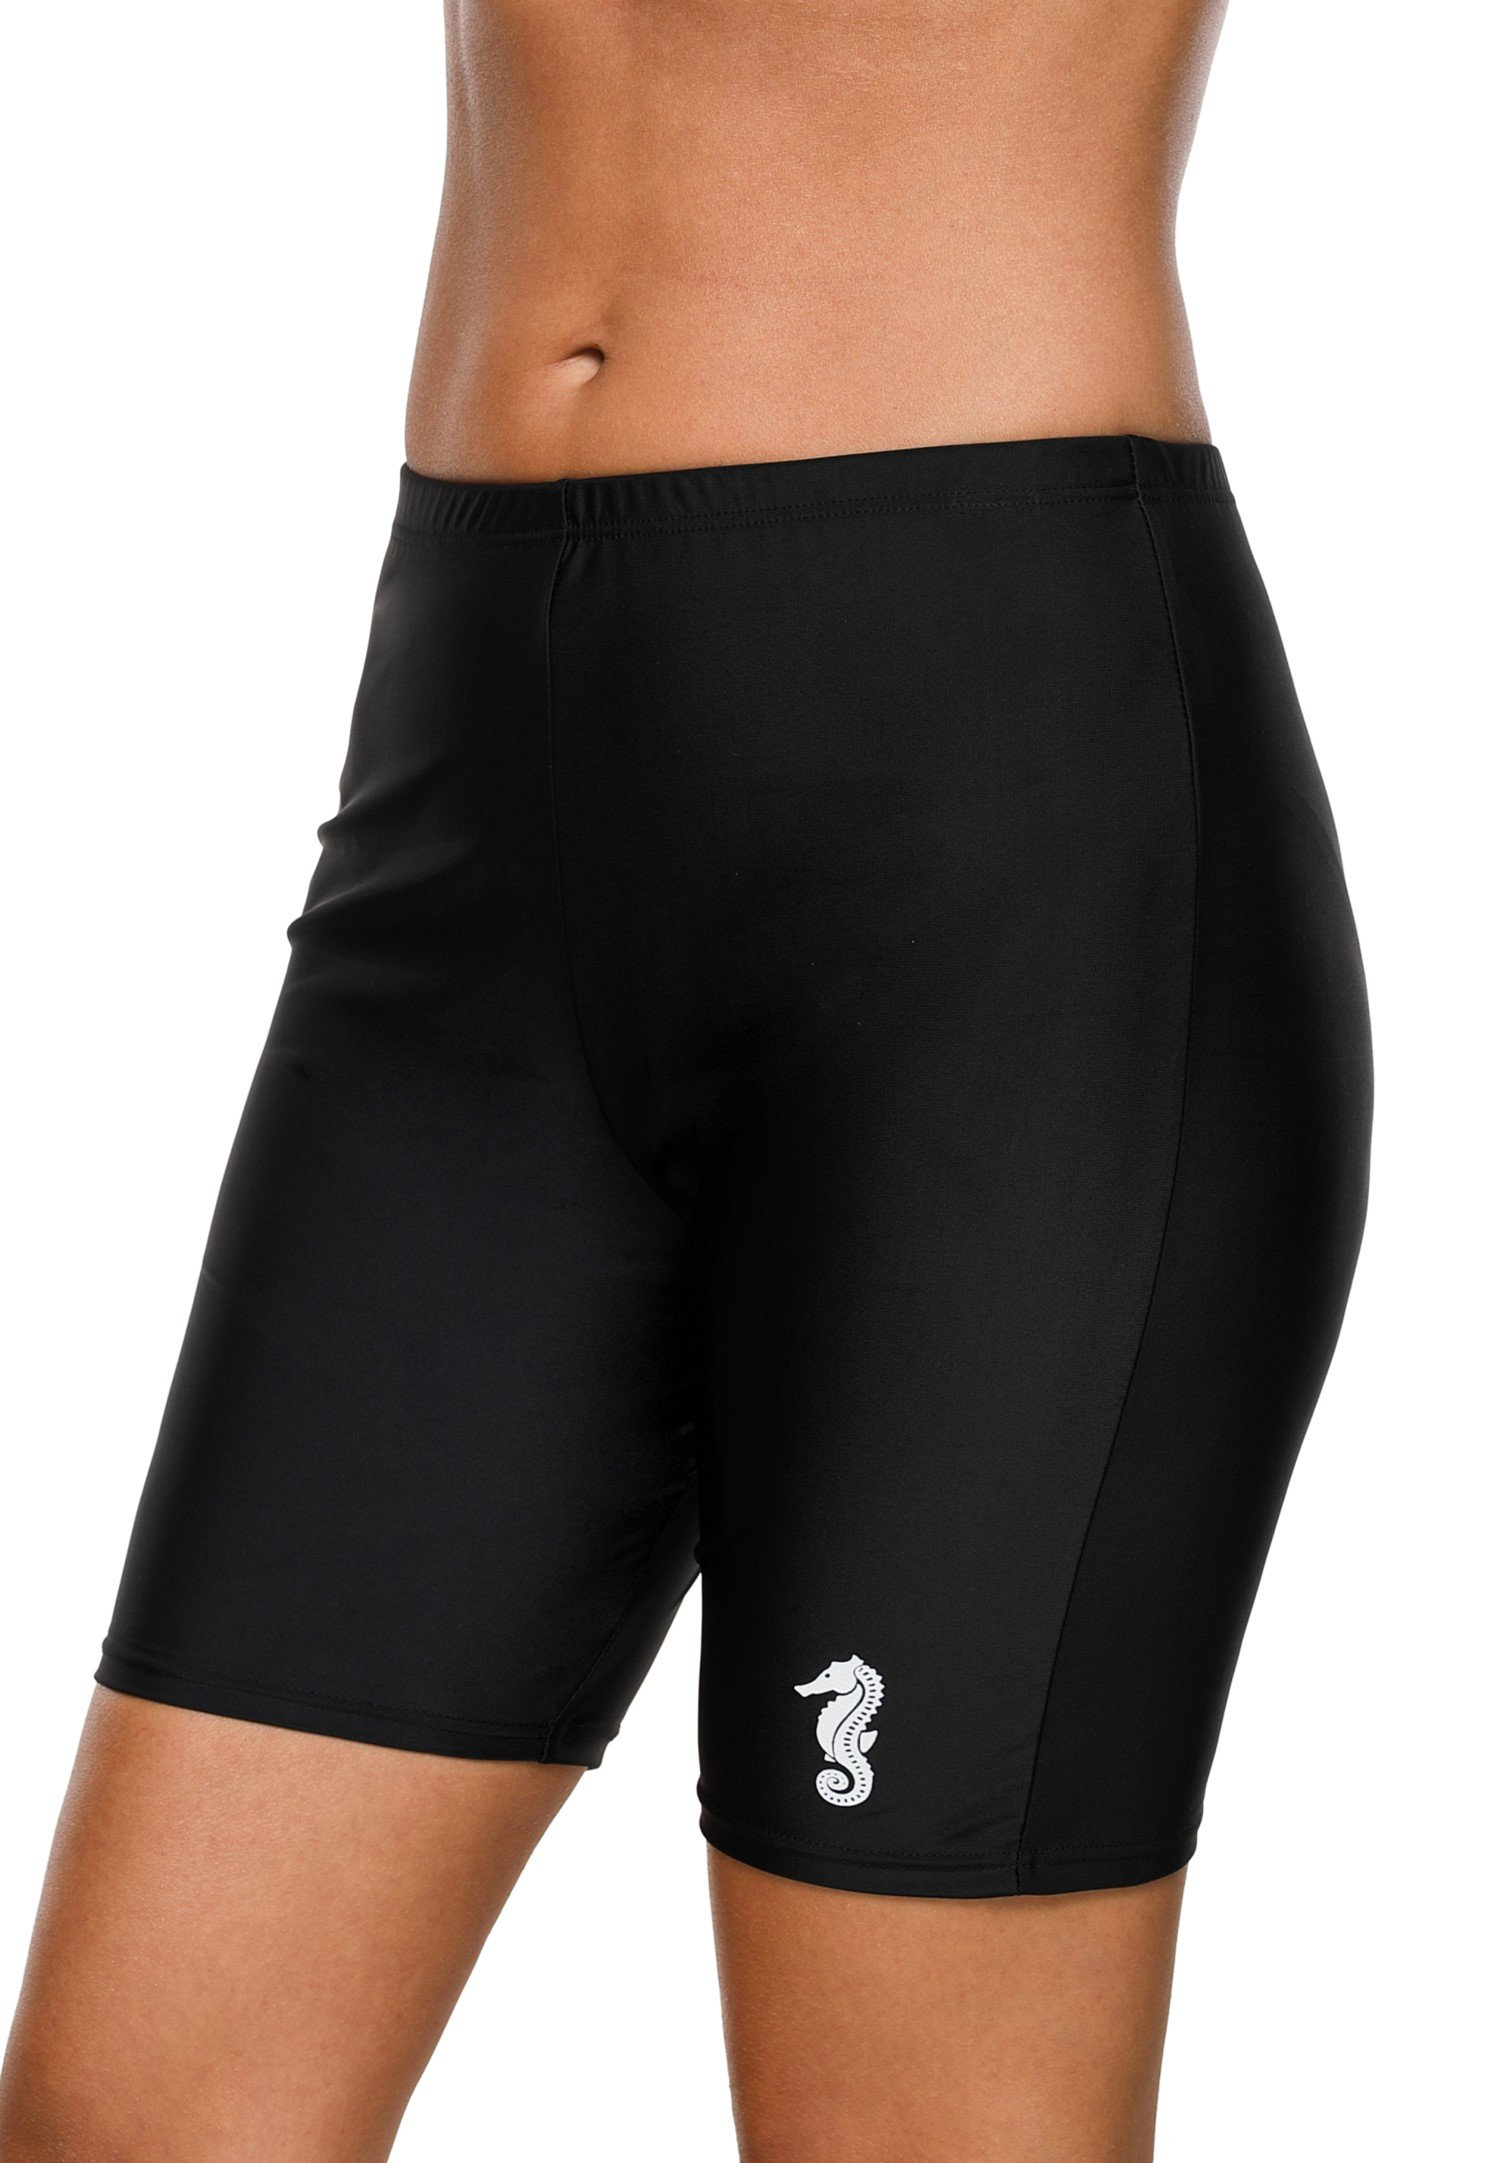 eulo Women's Boyleg Swim Shorts Seahorse Print Long Board Short Solid Beach Bottom Black L